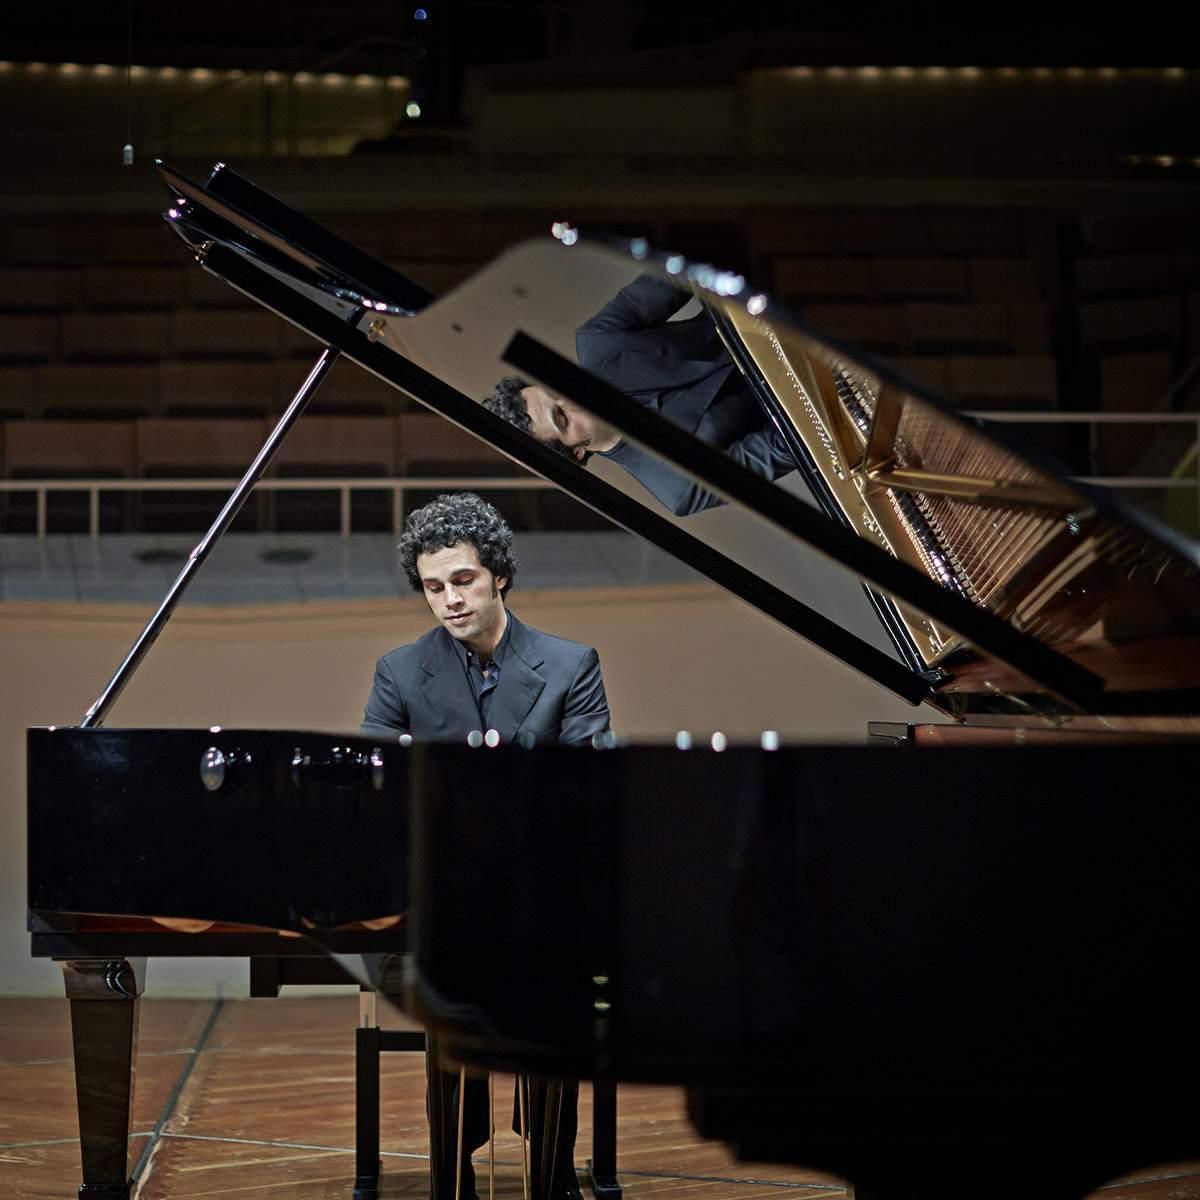 Soheil Nasseri Solo Recital at Merkin Hall